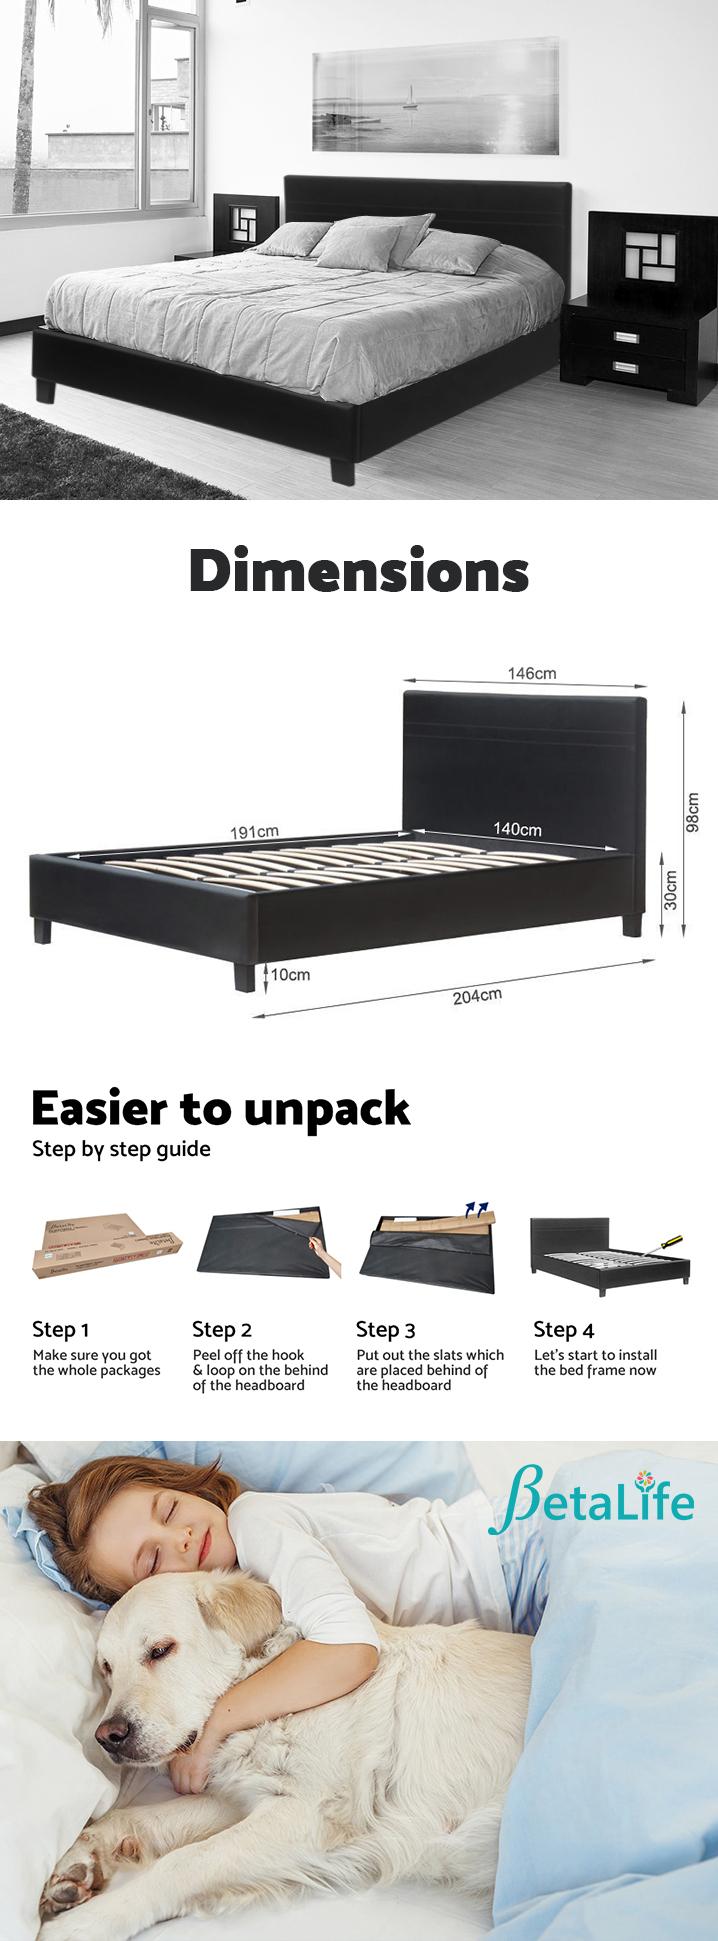 DOUBLE Slat PU Bed with Headboard